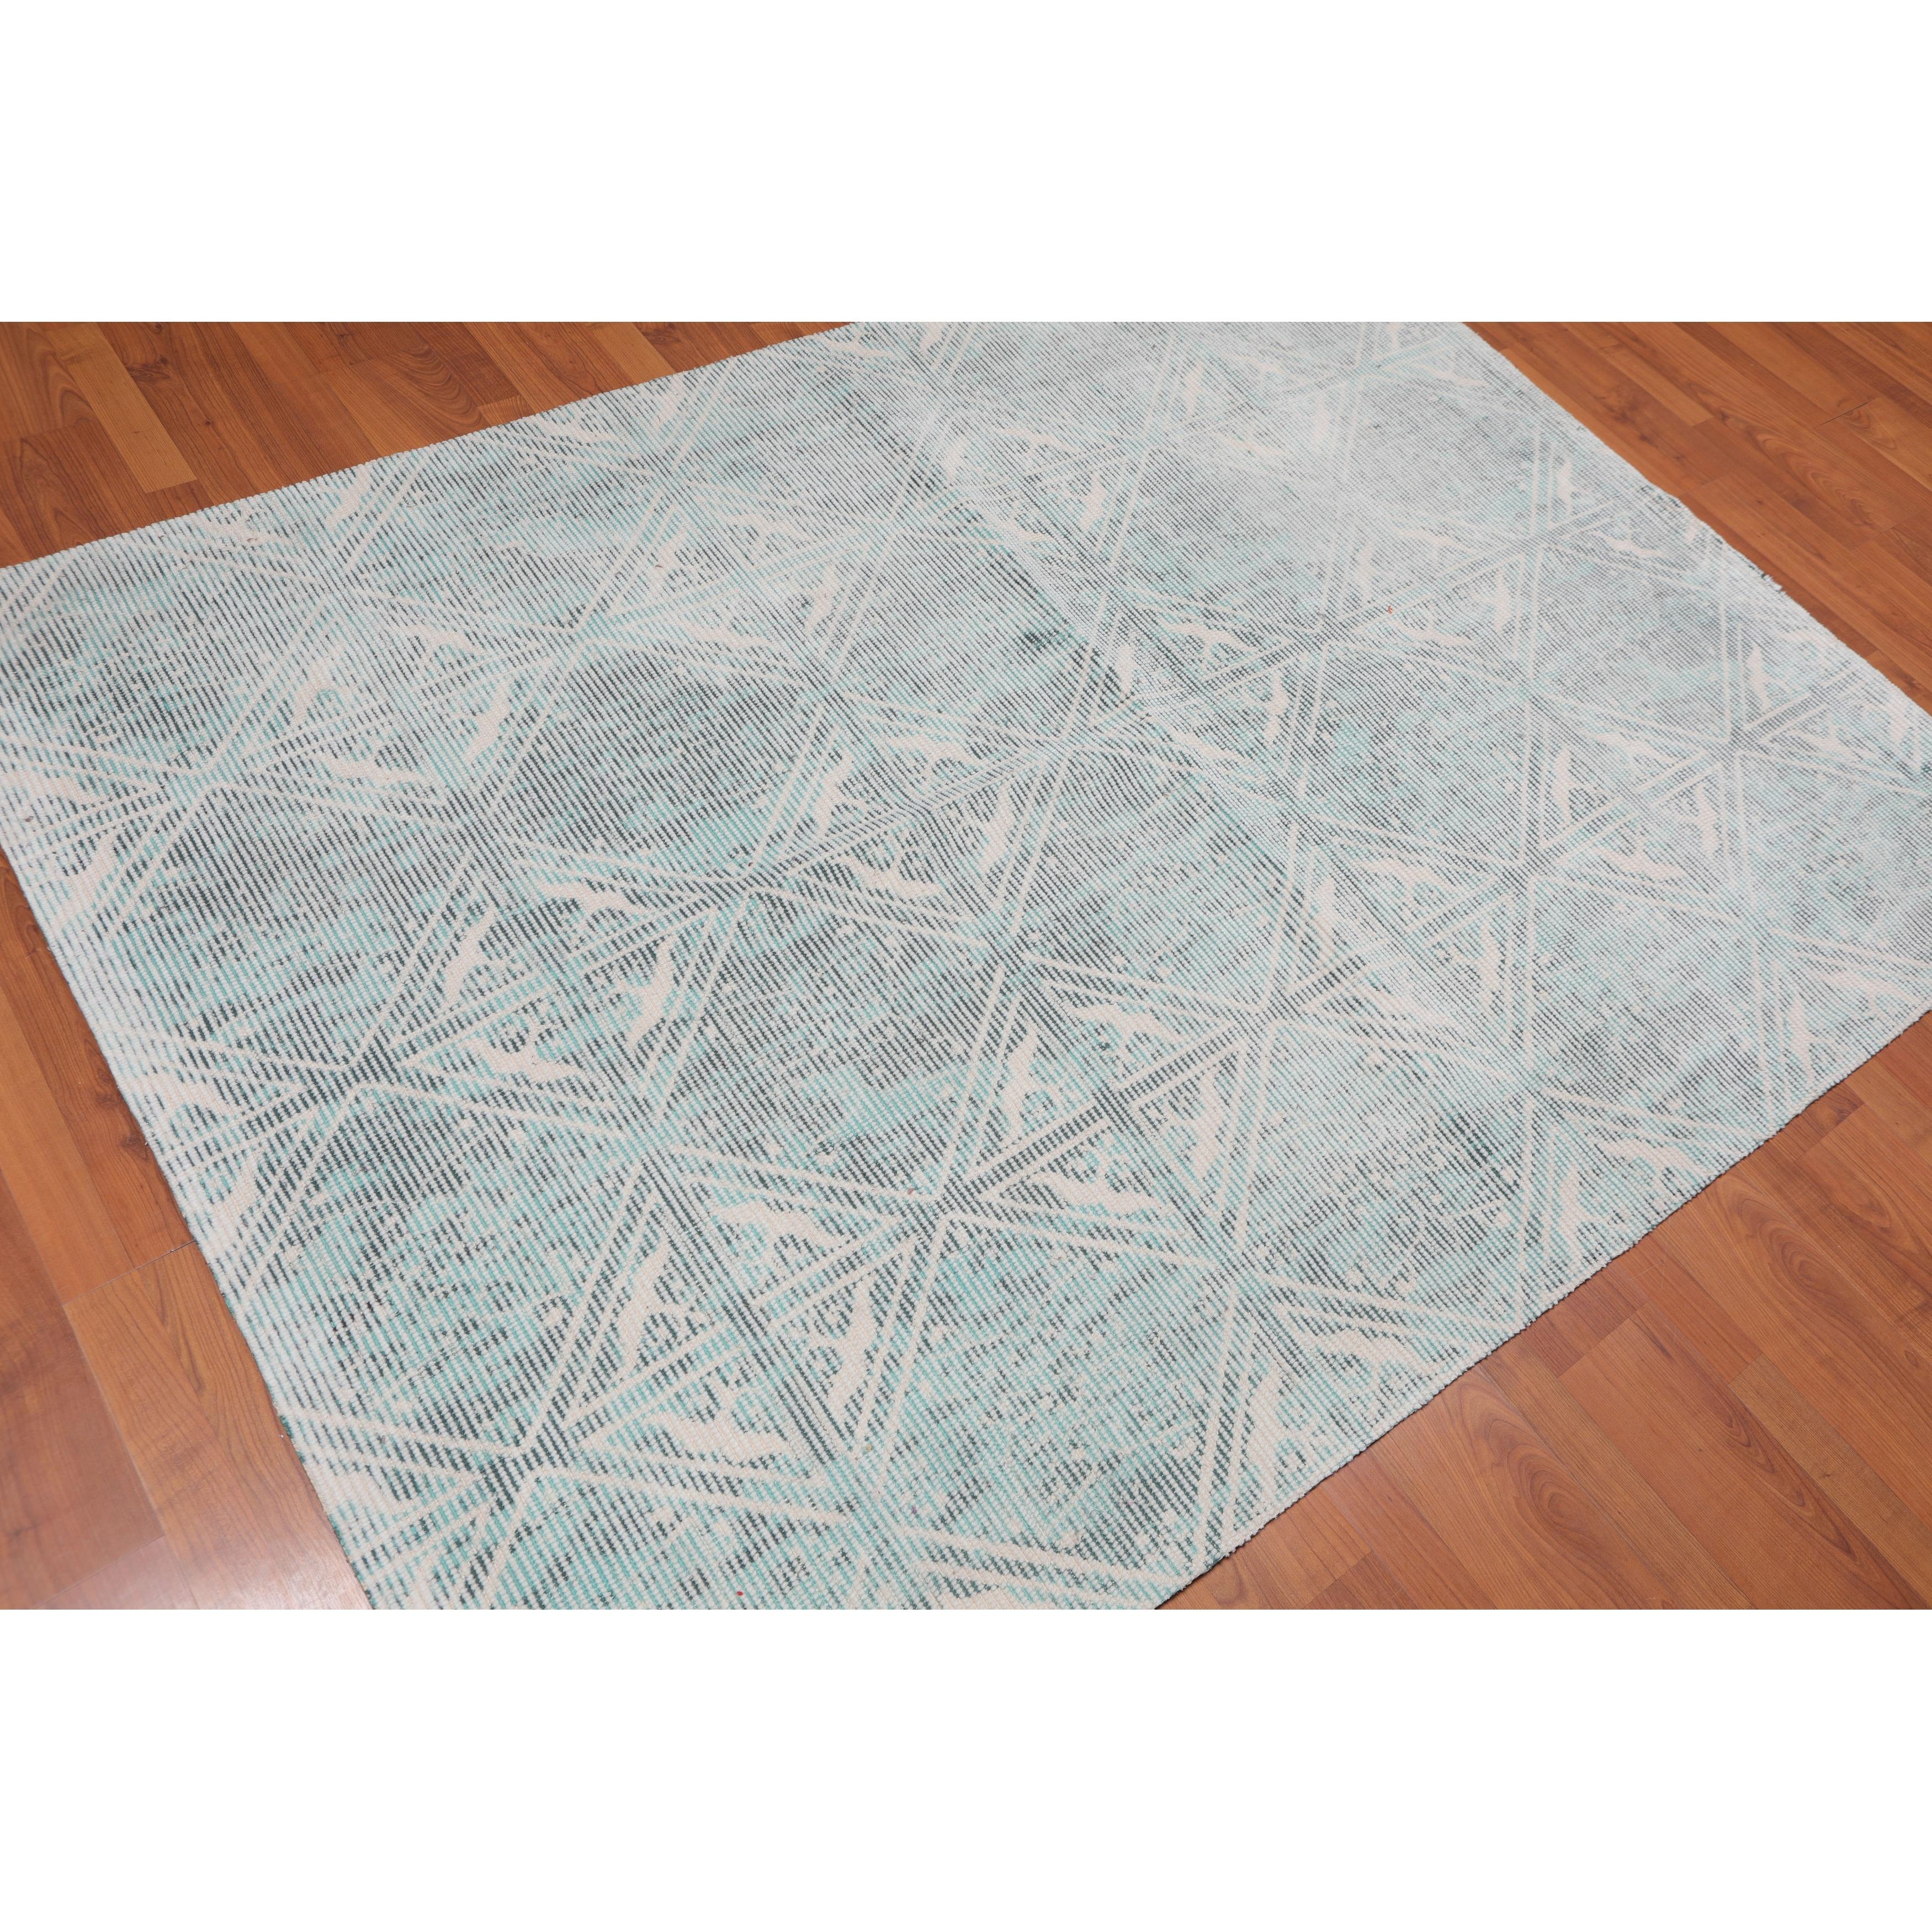 Hand Made Ivory Aqua Area Rug Wool Modern Contemporary Oriental Area Rug 5x7 5 X 6 9 Overstock 31523644